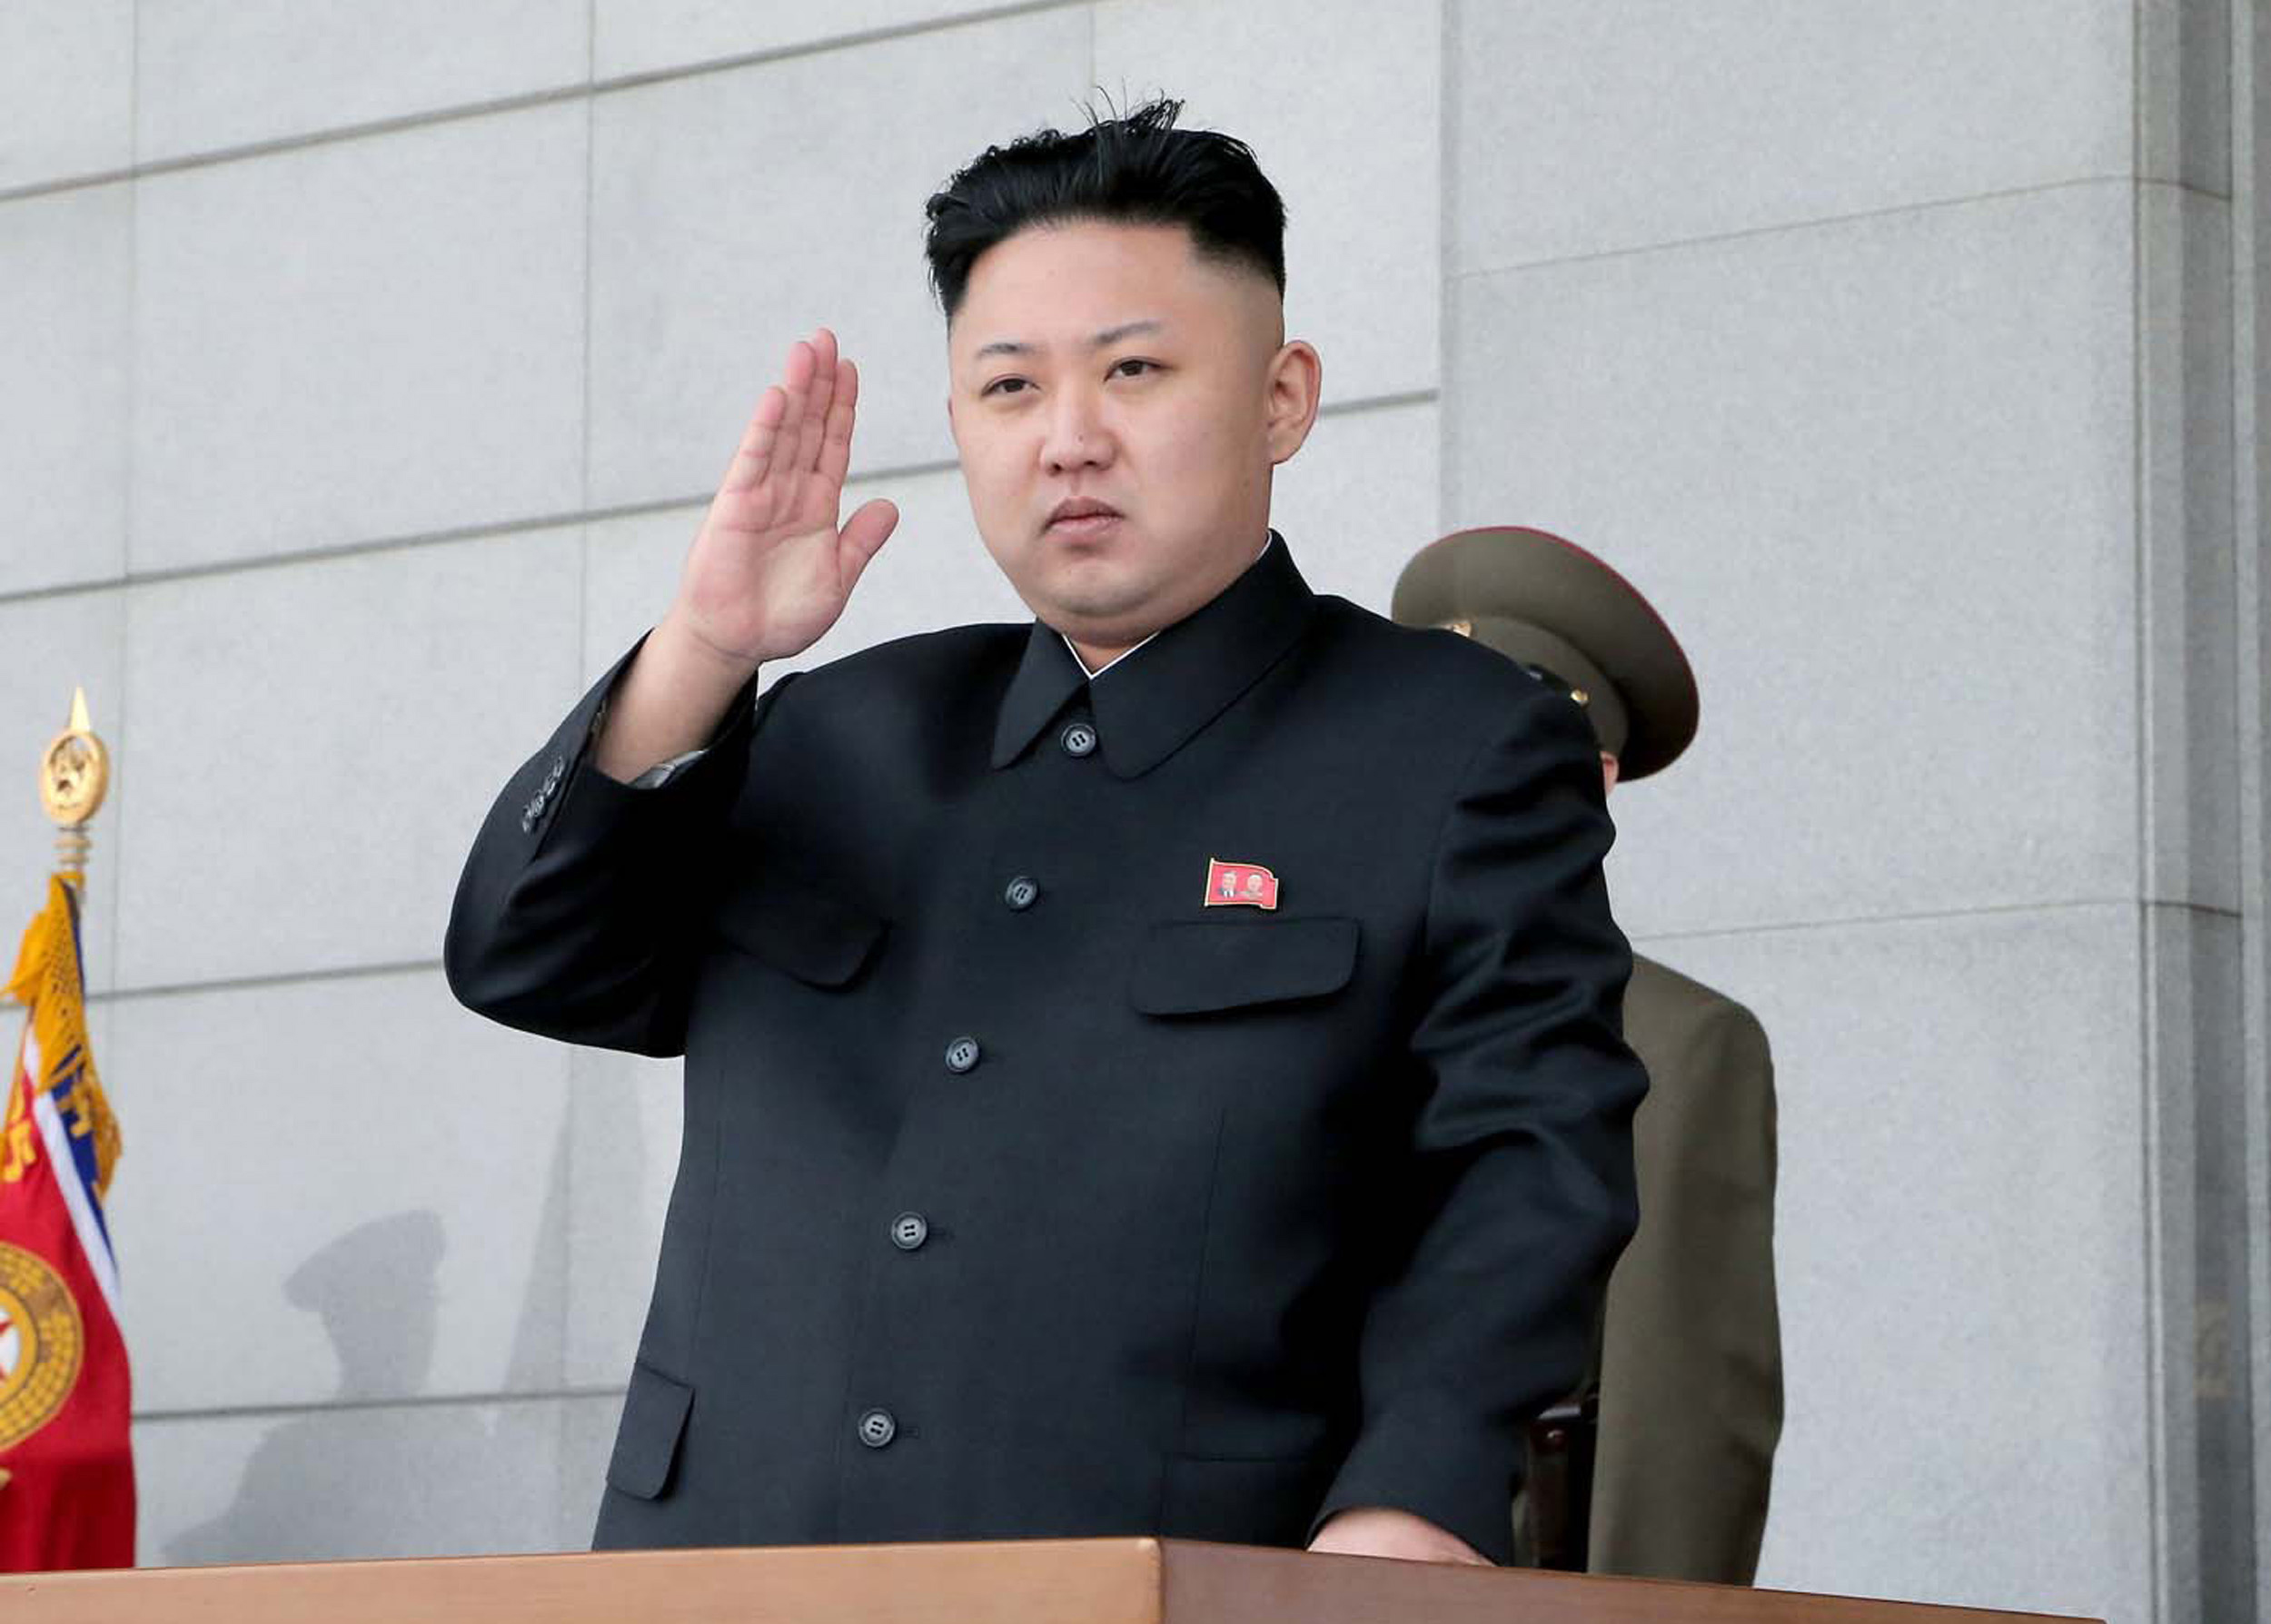 De Noord-Koreaanse leider Kim Jong-Un. Foto: AFP / Kcna Via Kns